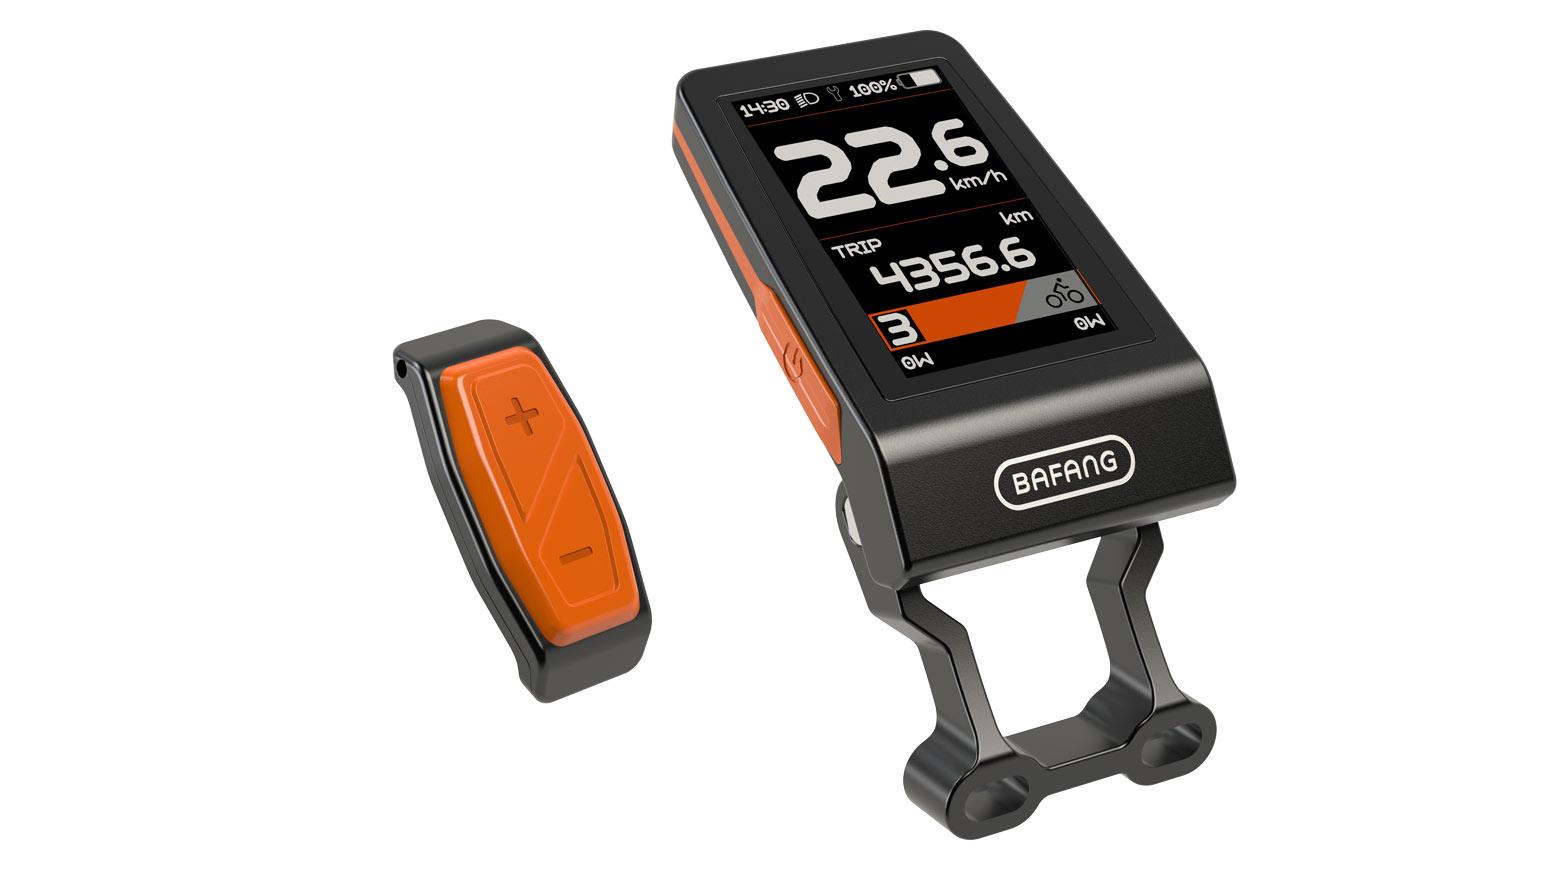 Bafang-M800-Display+Controller